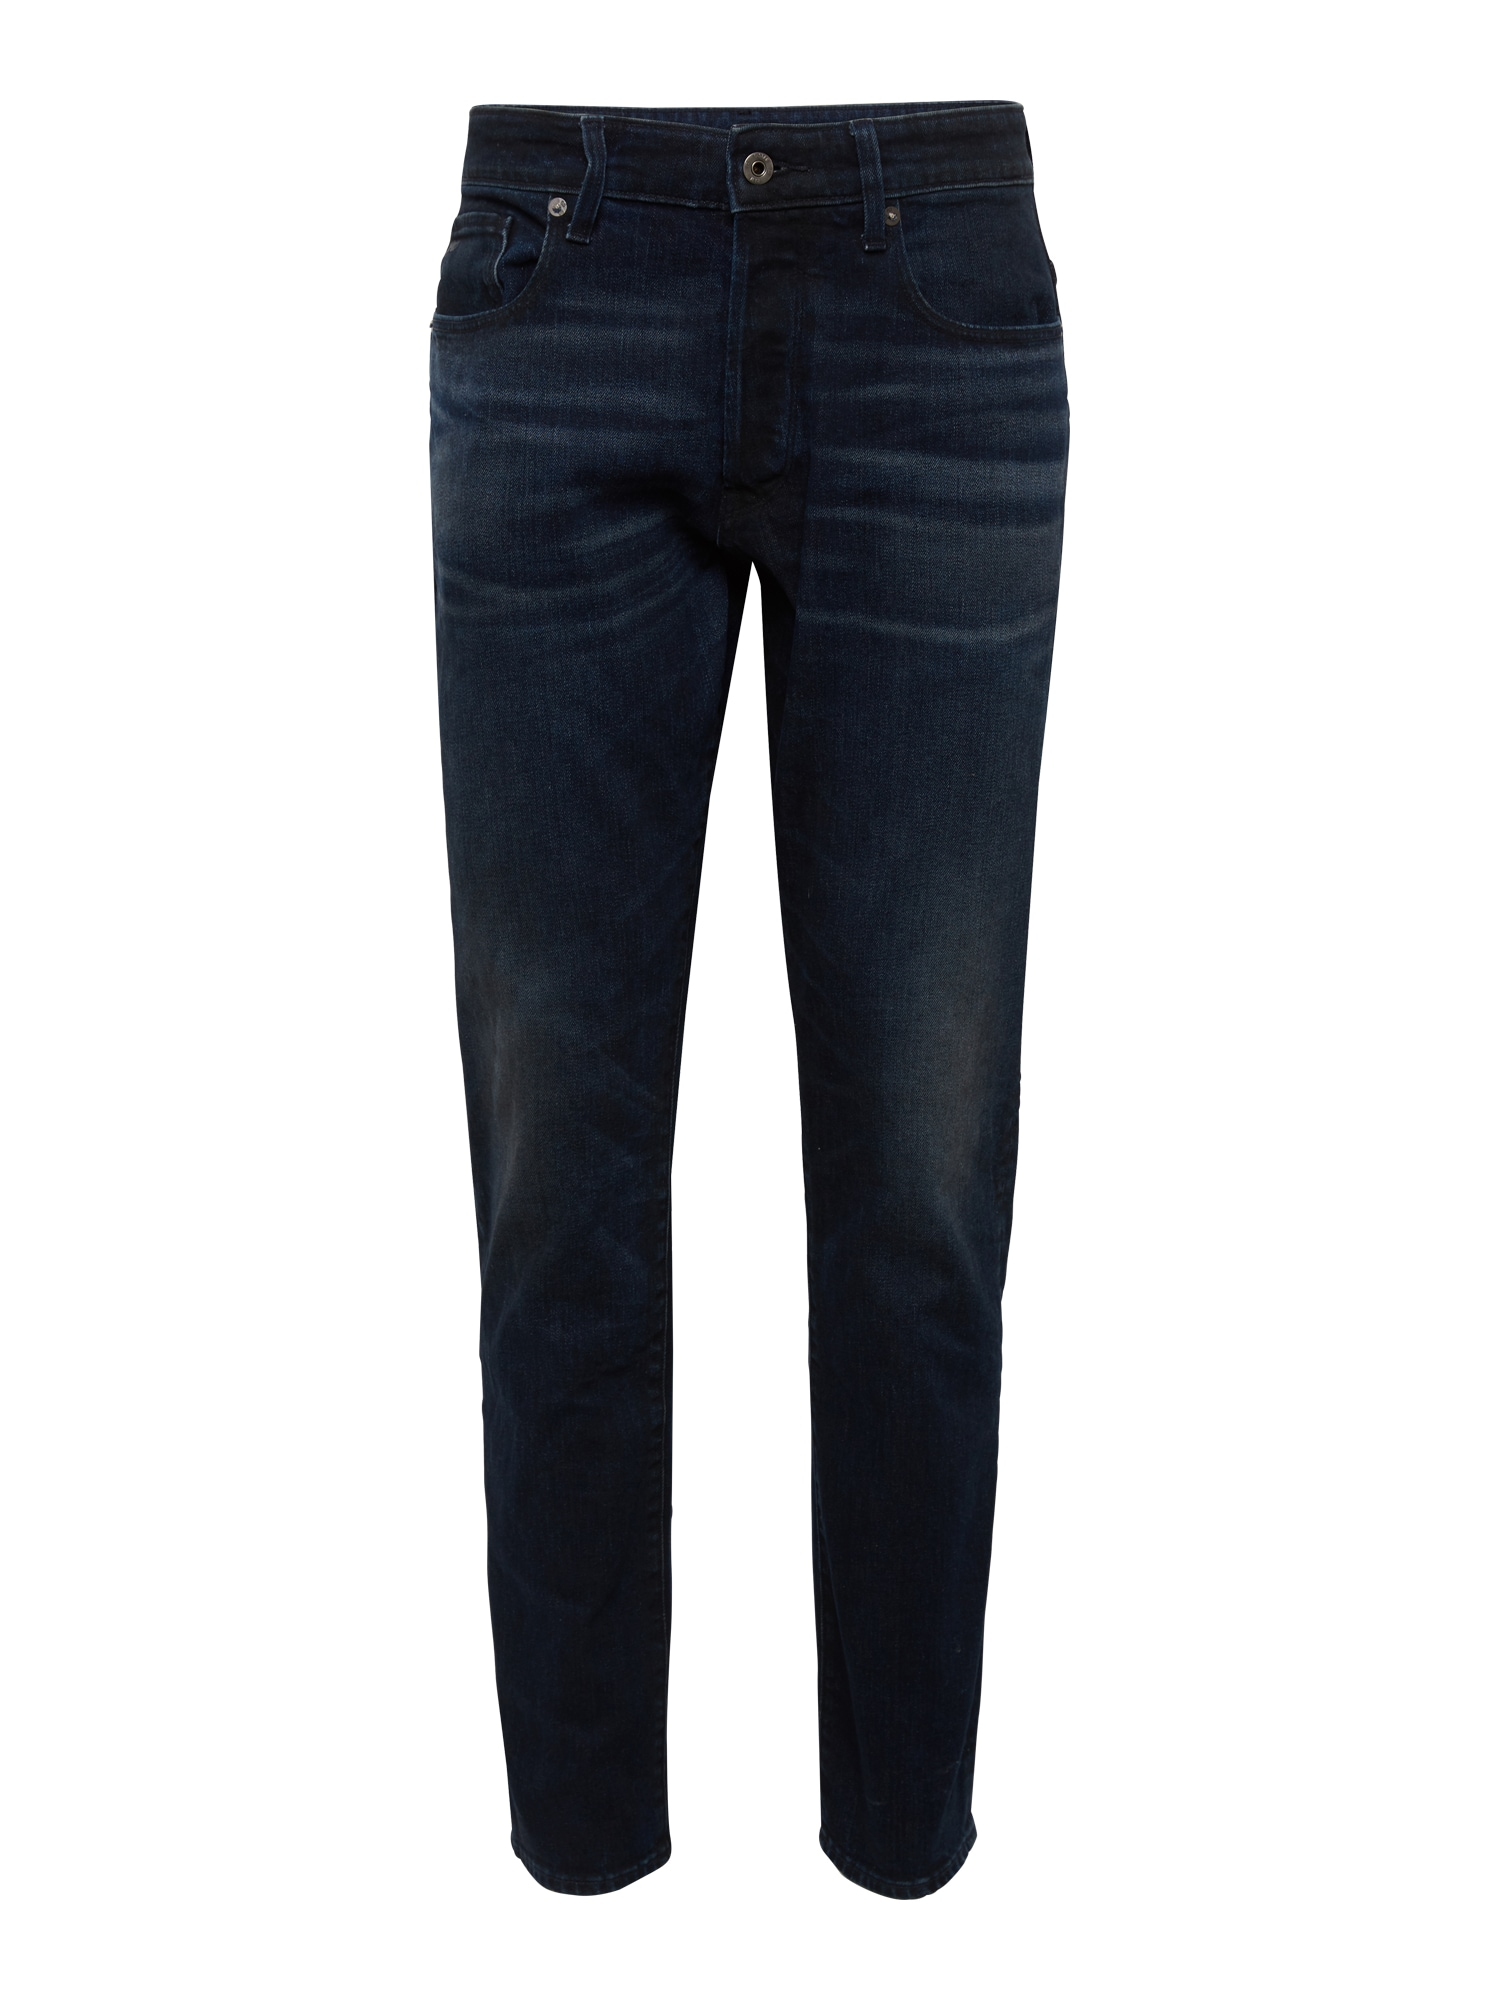 G-STAR RAW Heren Jeans 3301 Tapered donkerblauw